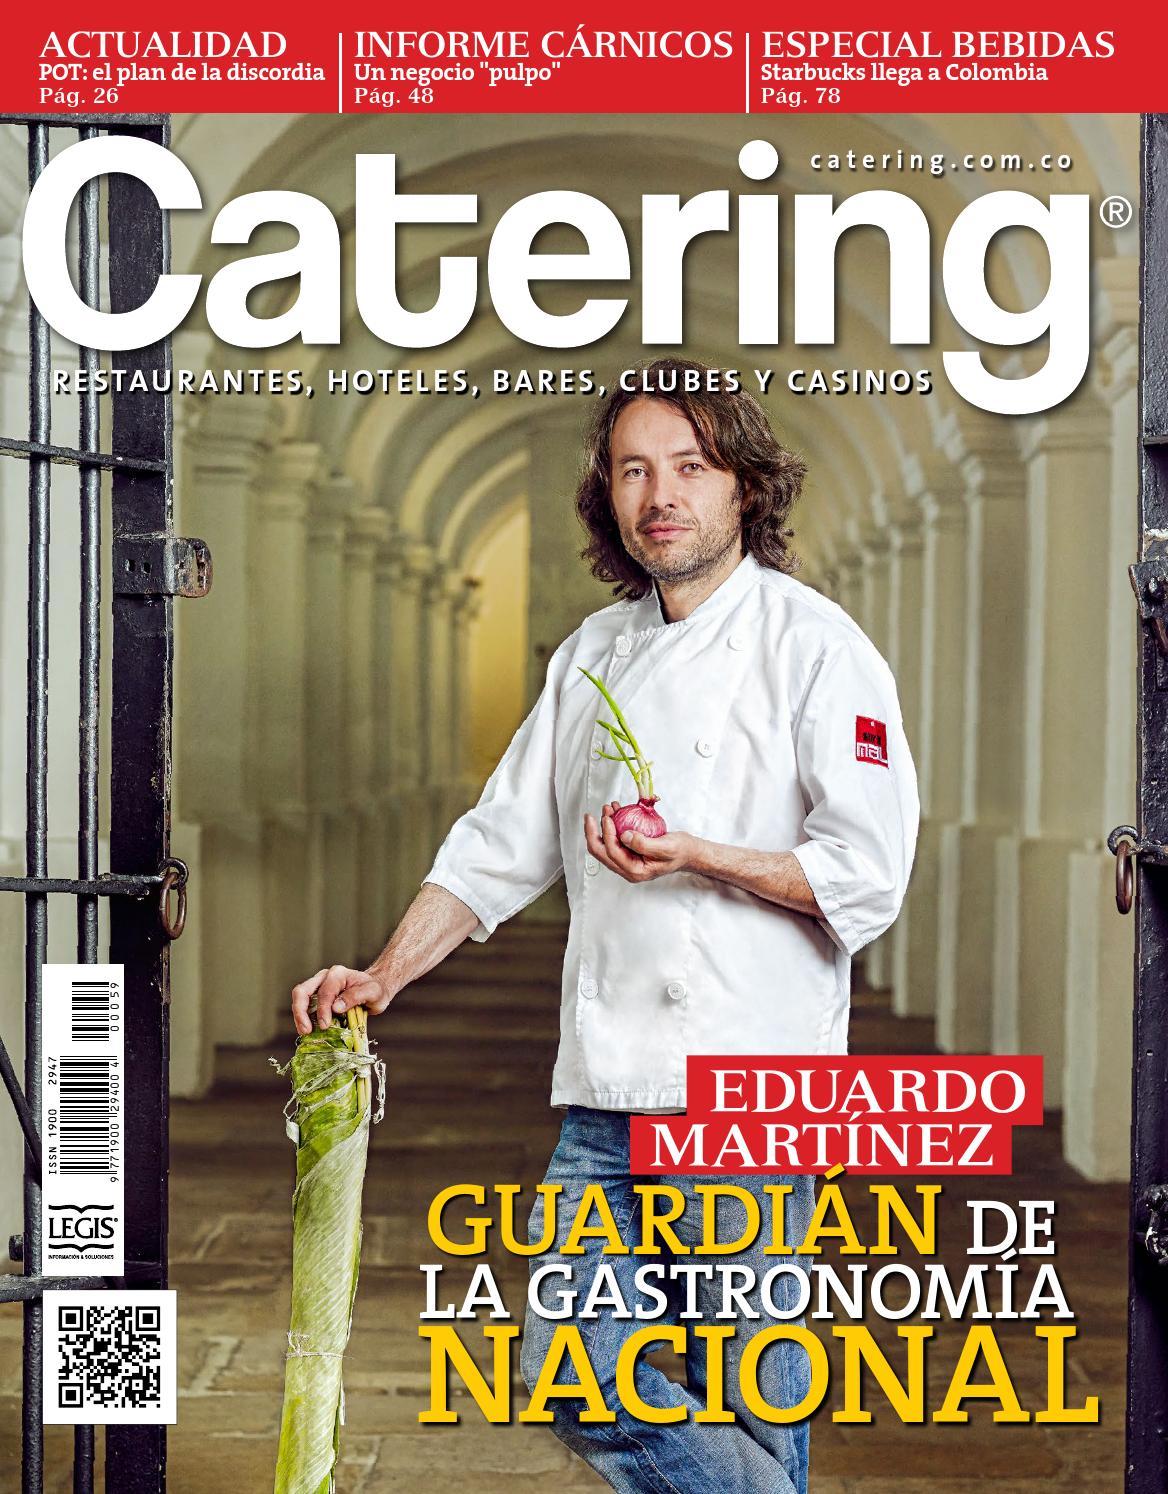 Catering ed 59 web by LEGIS SA - issuu